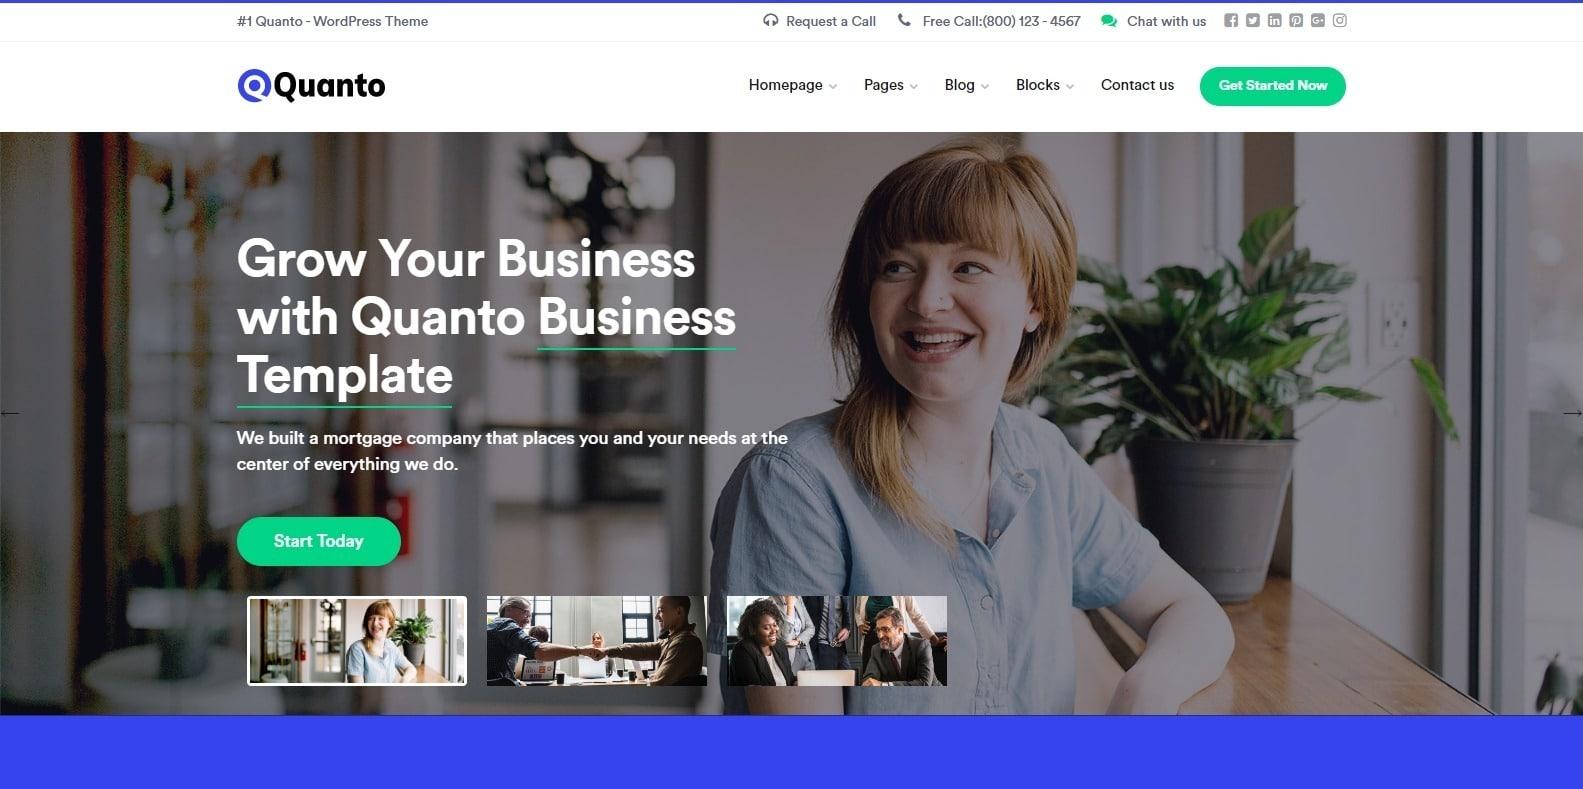 Buy business broker website templates from $3. 15 Professional WordPress Mortgage Broker Website Template For 2020